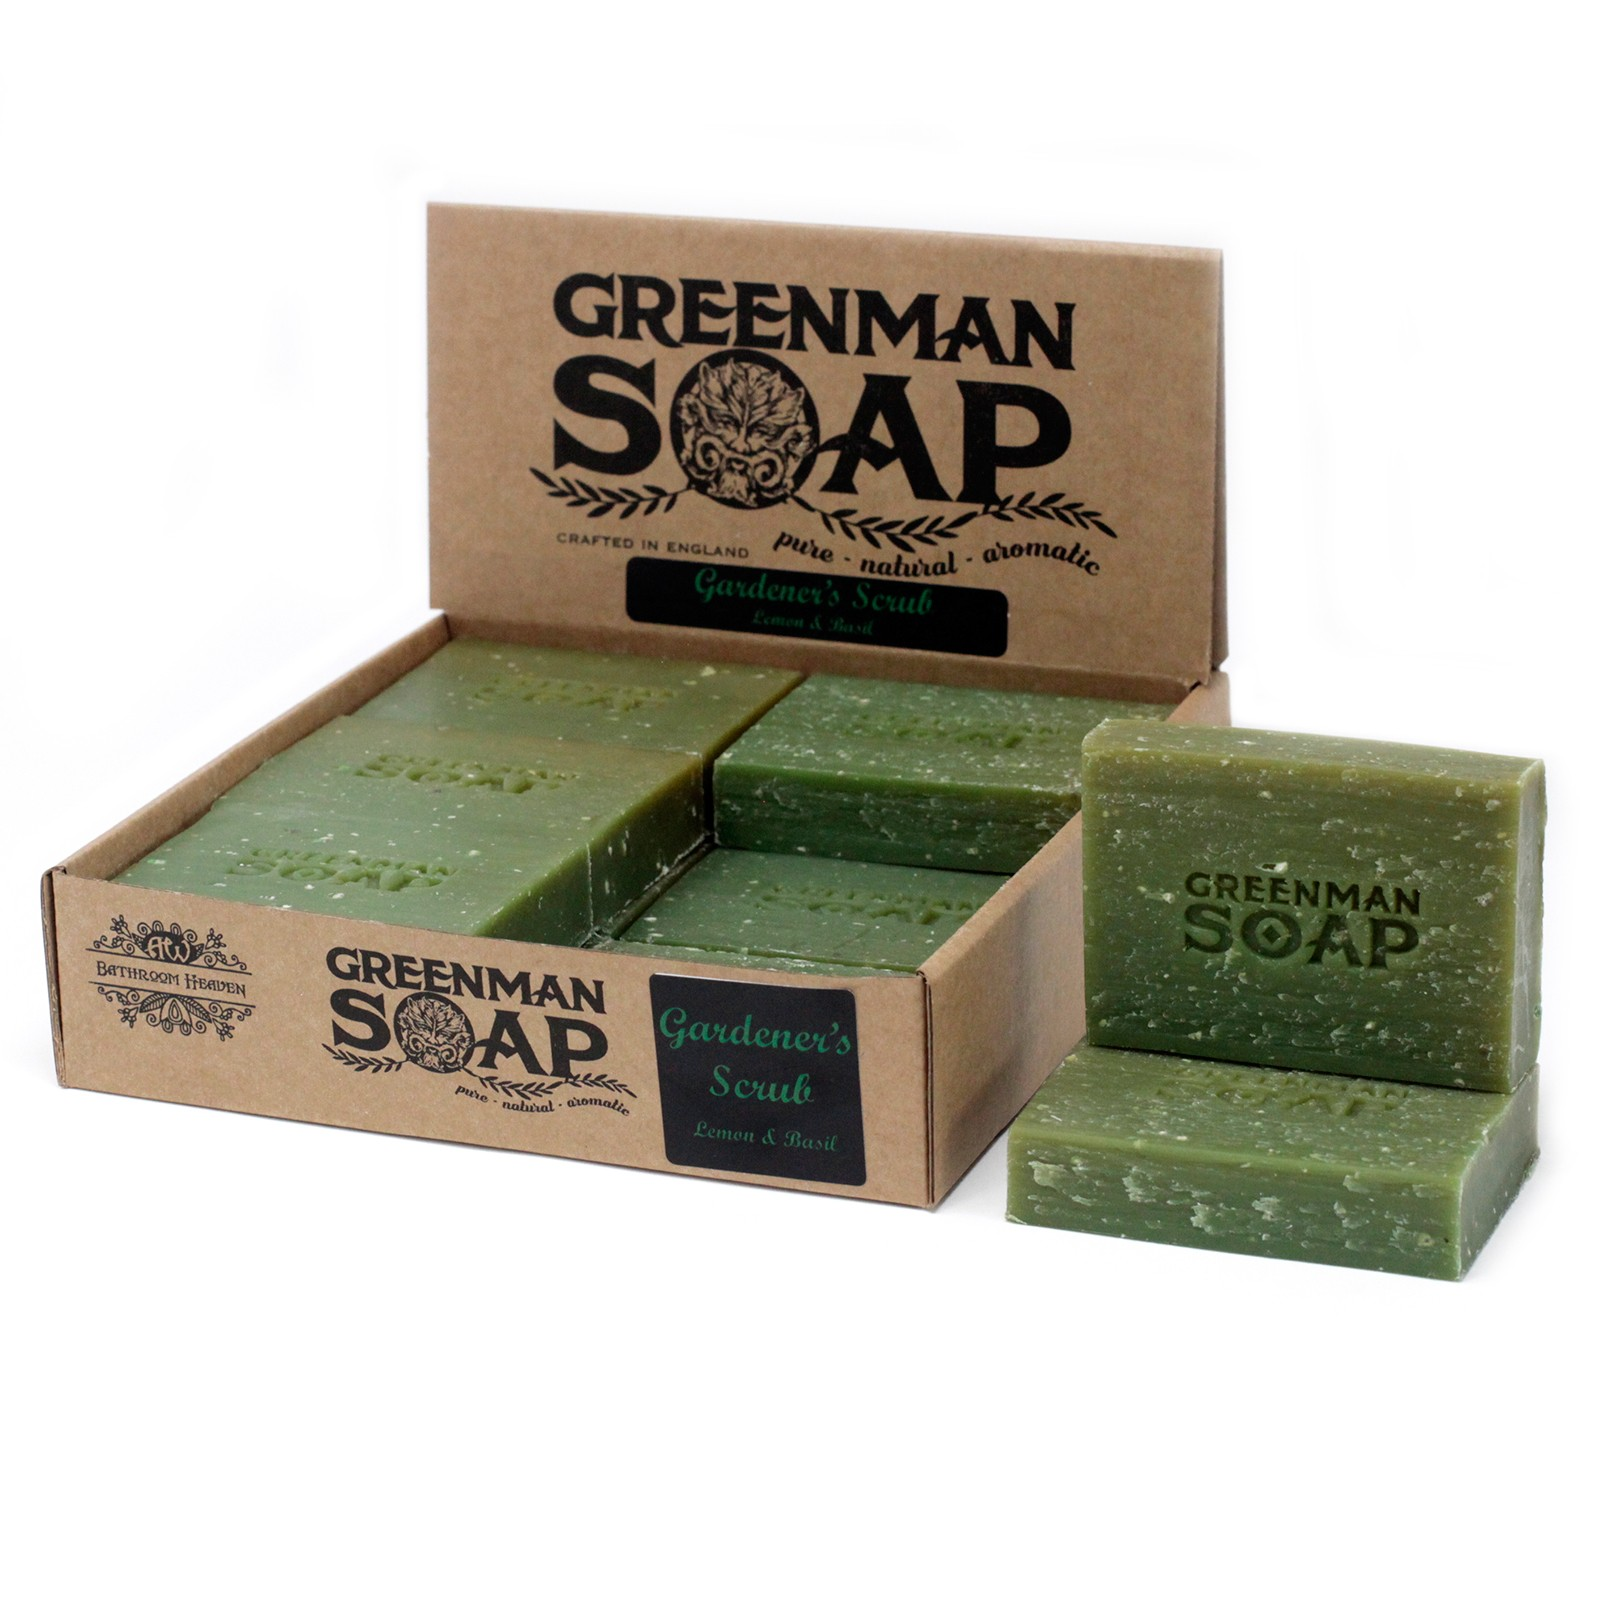 Greenman Soap 100g - Gardener's Scrub